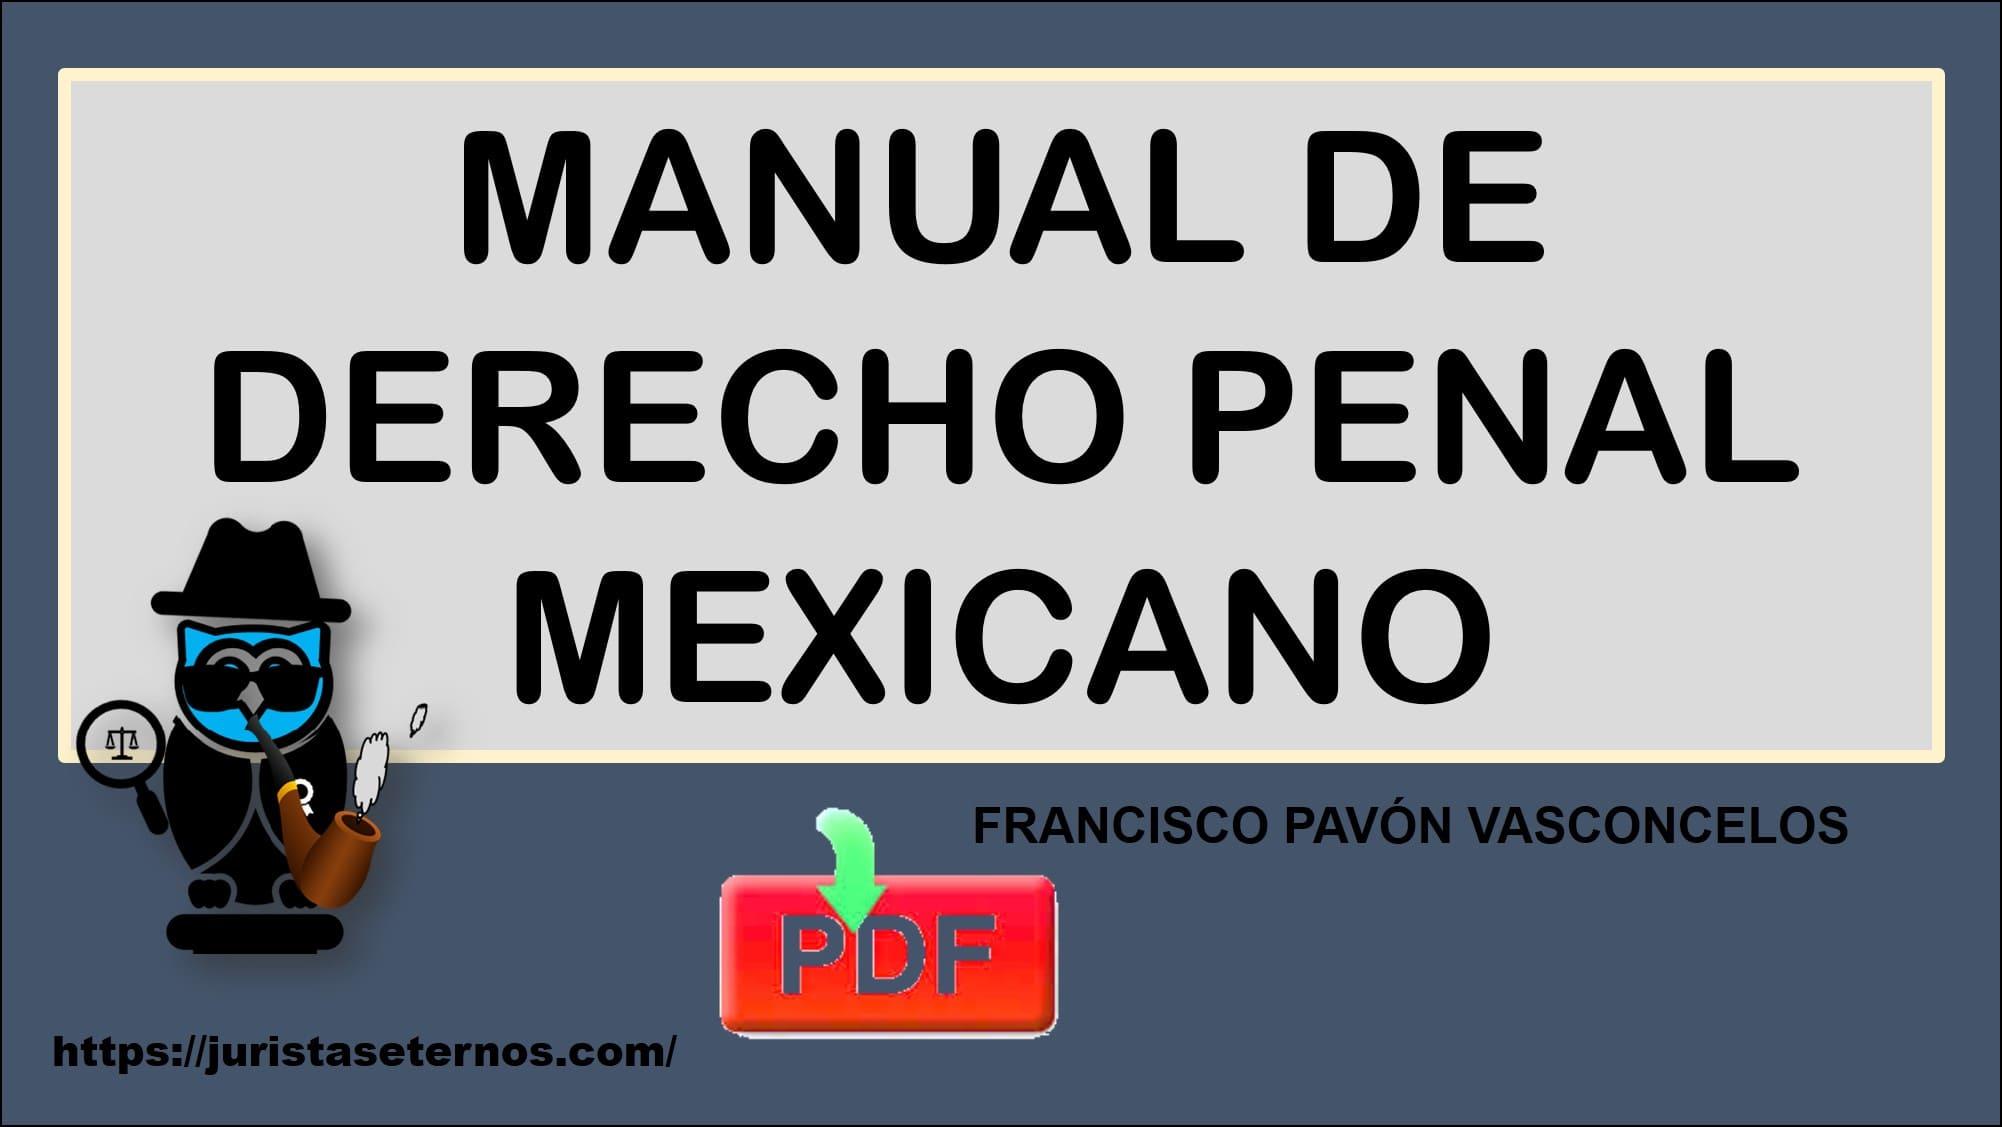 manual de derecho penal mexicano francisco pavon vasconcelos pdf